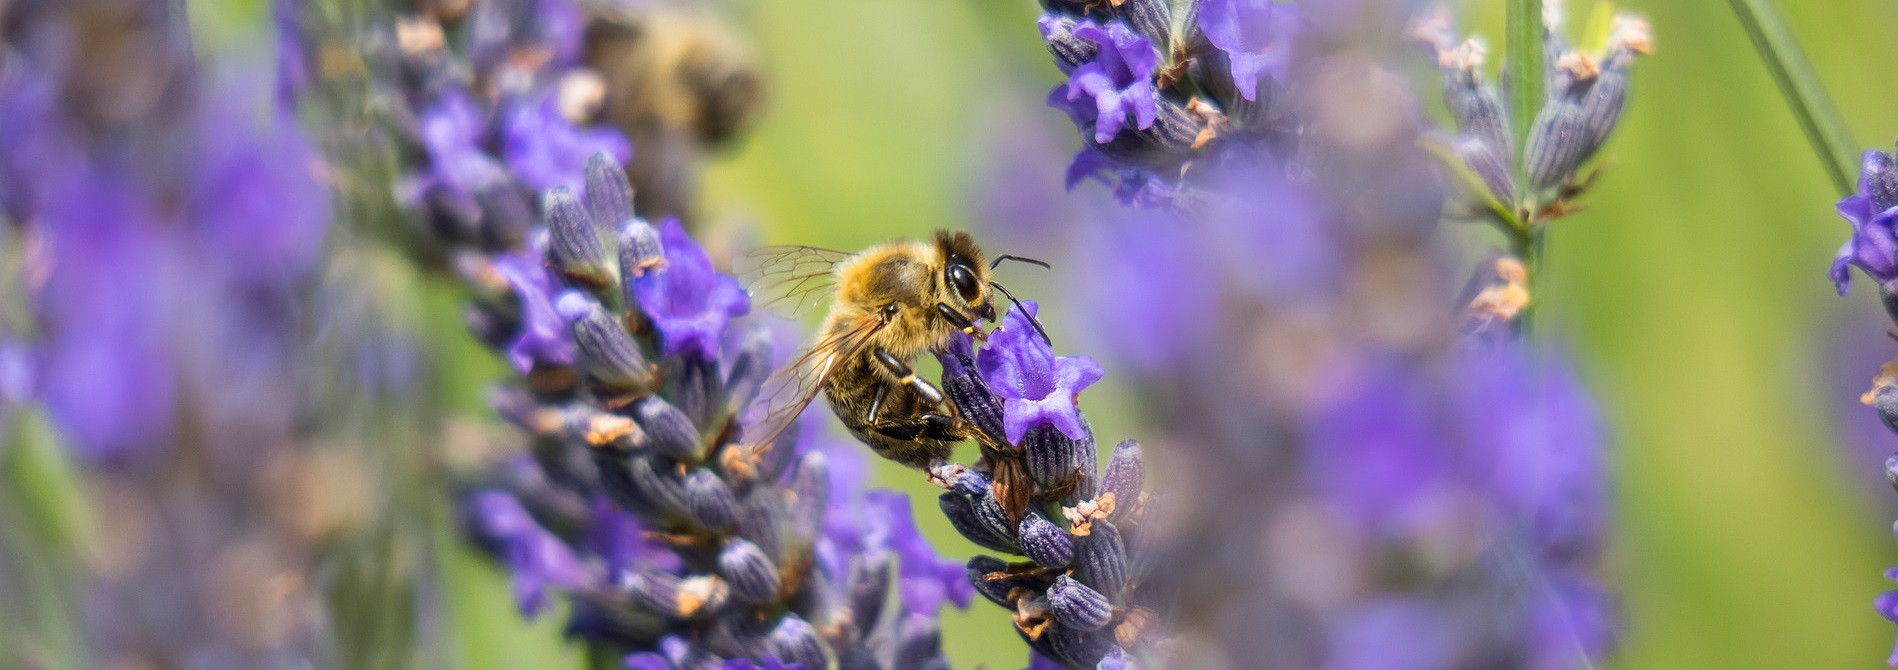 lavender-4356162_1920.jpg